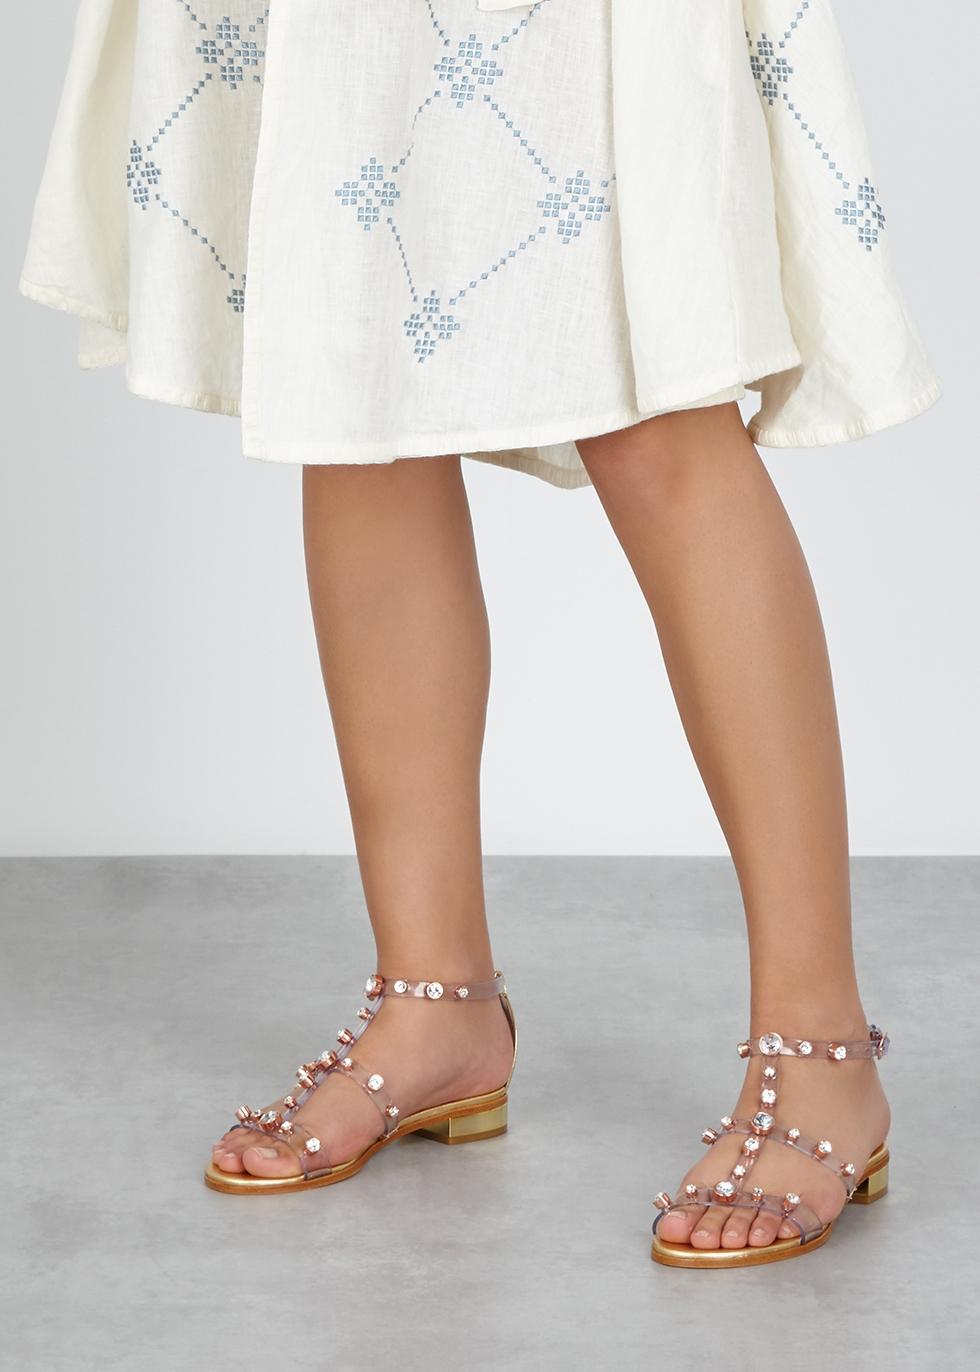 156689d8c09 Sophia Webster Shoes - Womens - Harvey Nichols